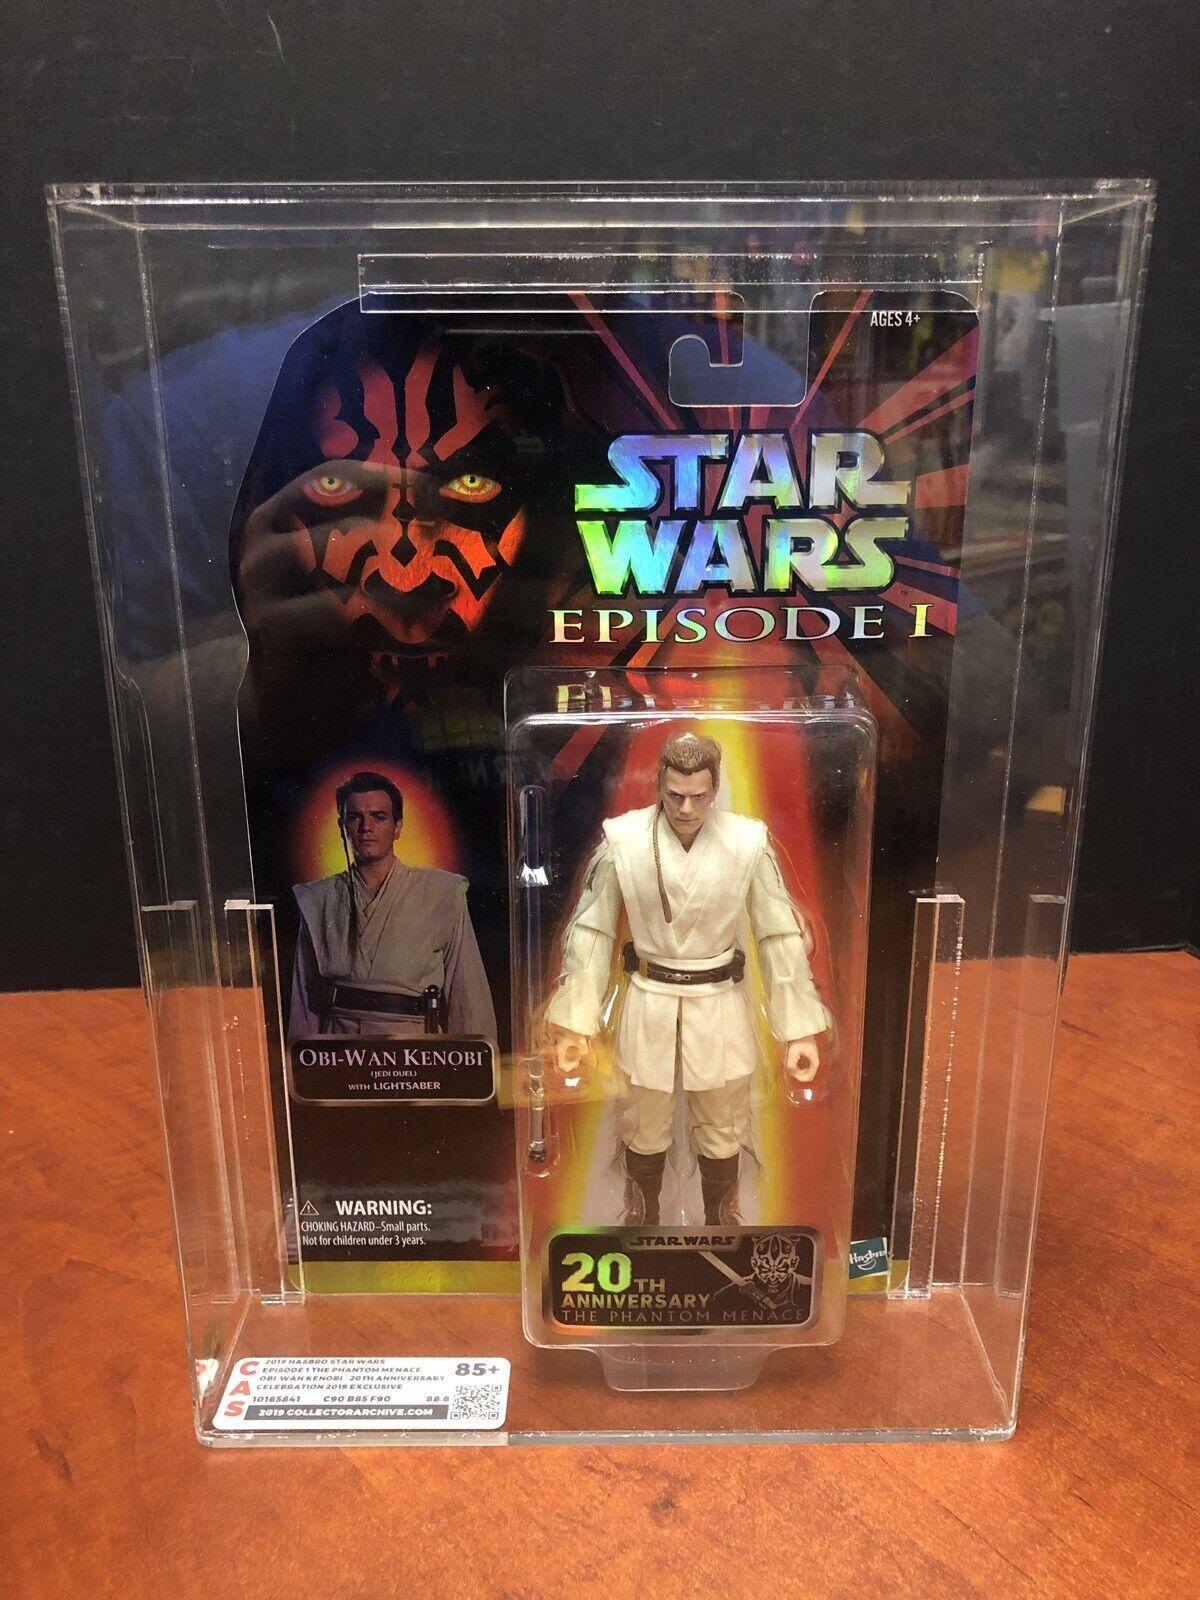 2019 Estrella Wars episodio 1 Obi-Wan Kenobi 20th celebración Excl. CAS 85+ EM3567